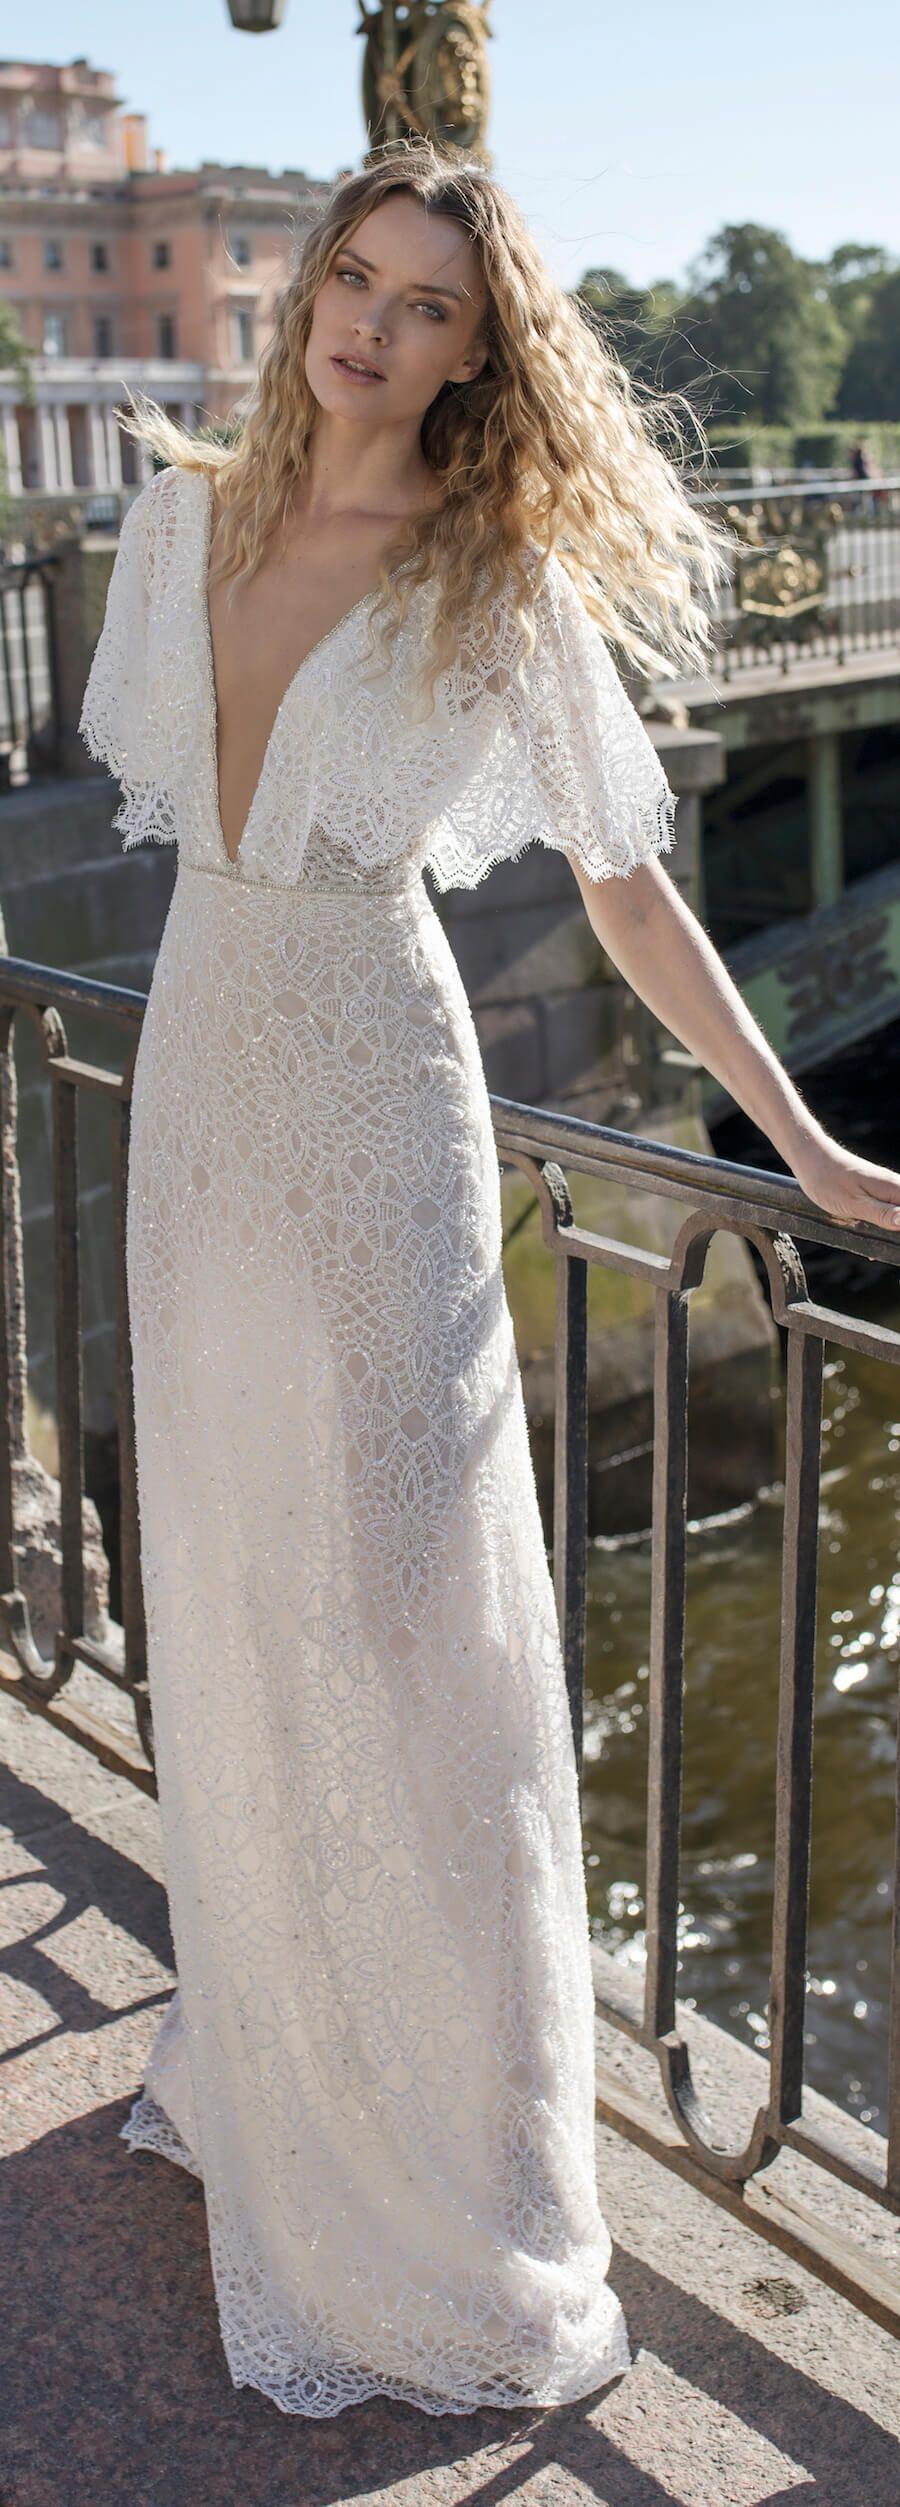 Lian rokman wedding dresses stardust bridal collection